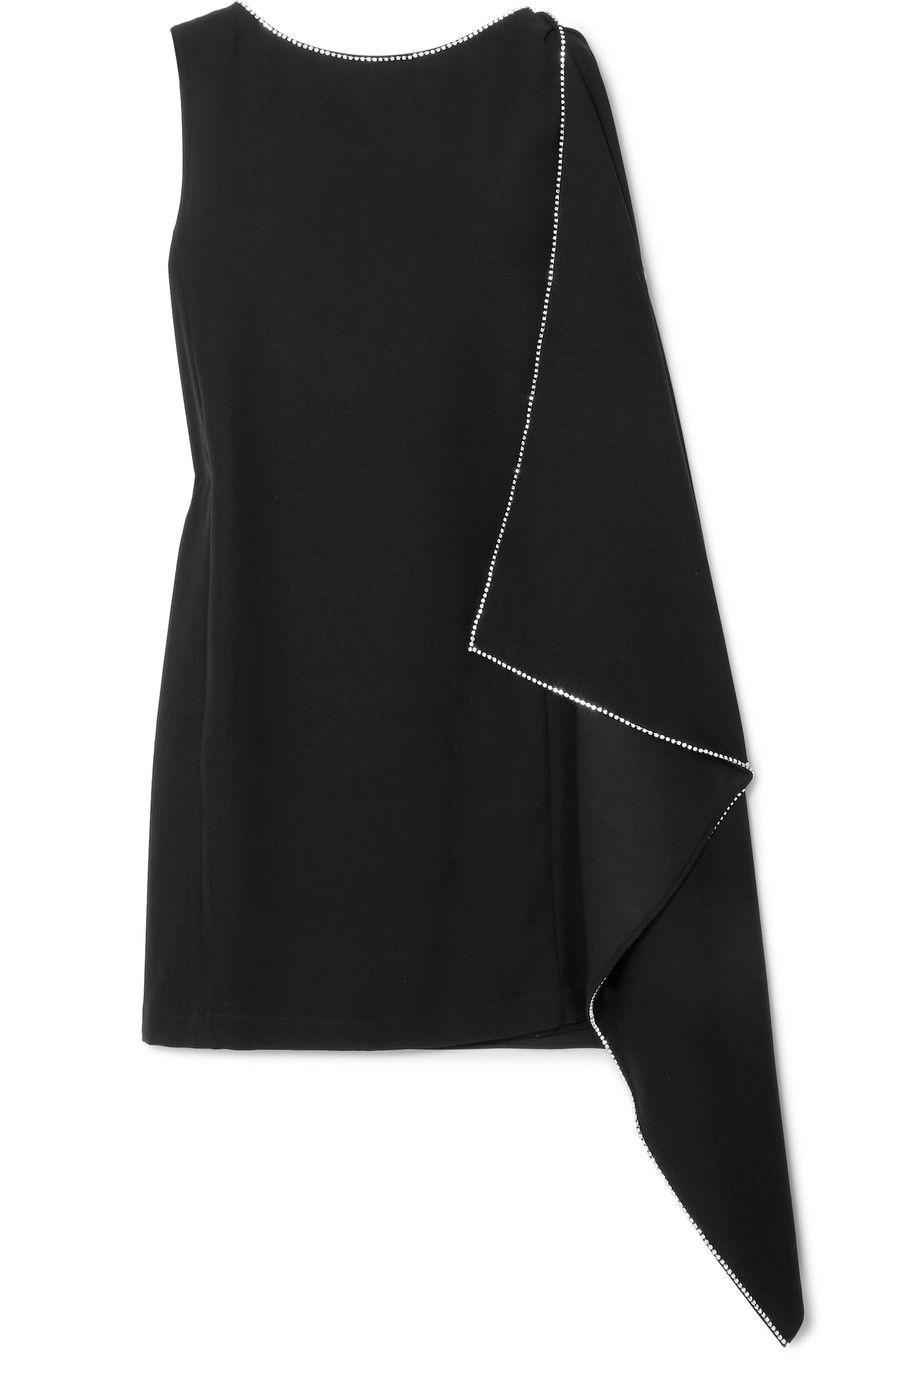 #PopbelaOOTD: Dress Hitam Siap Party!